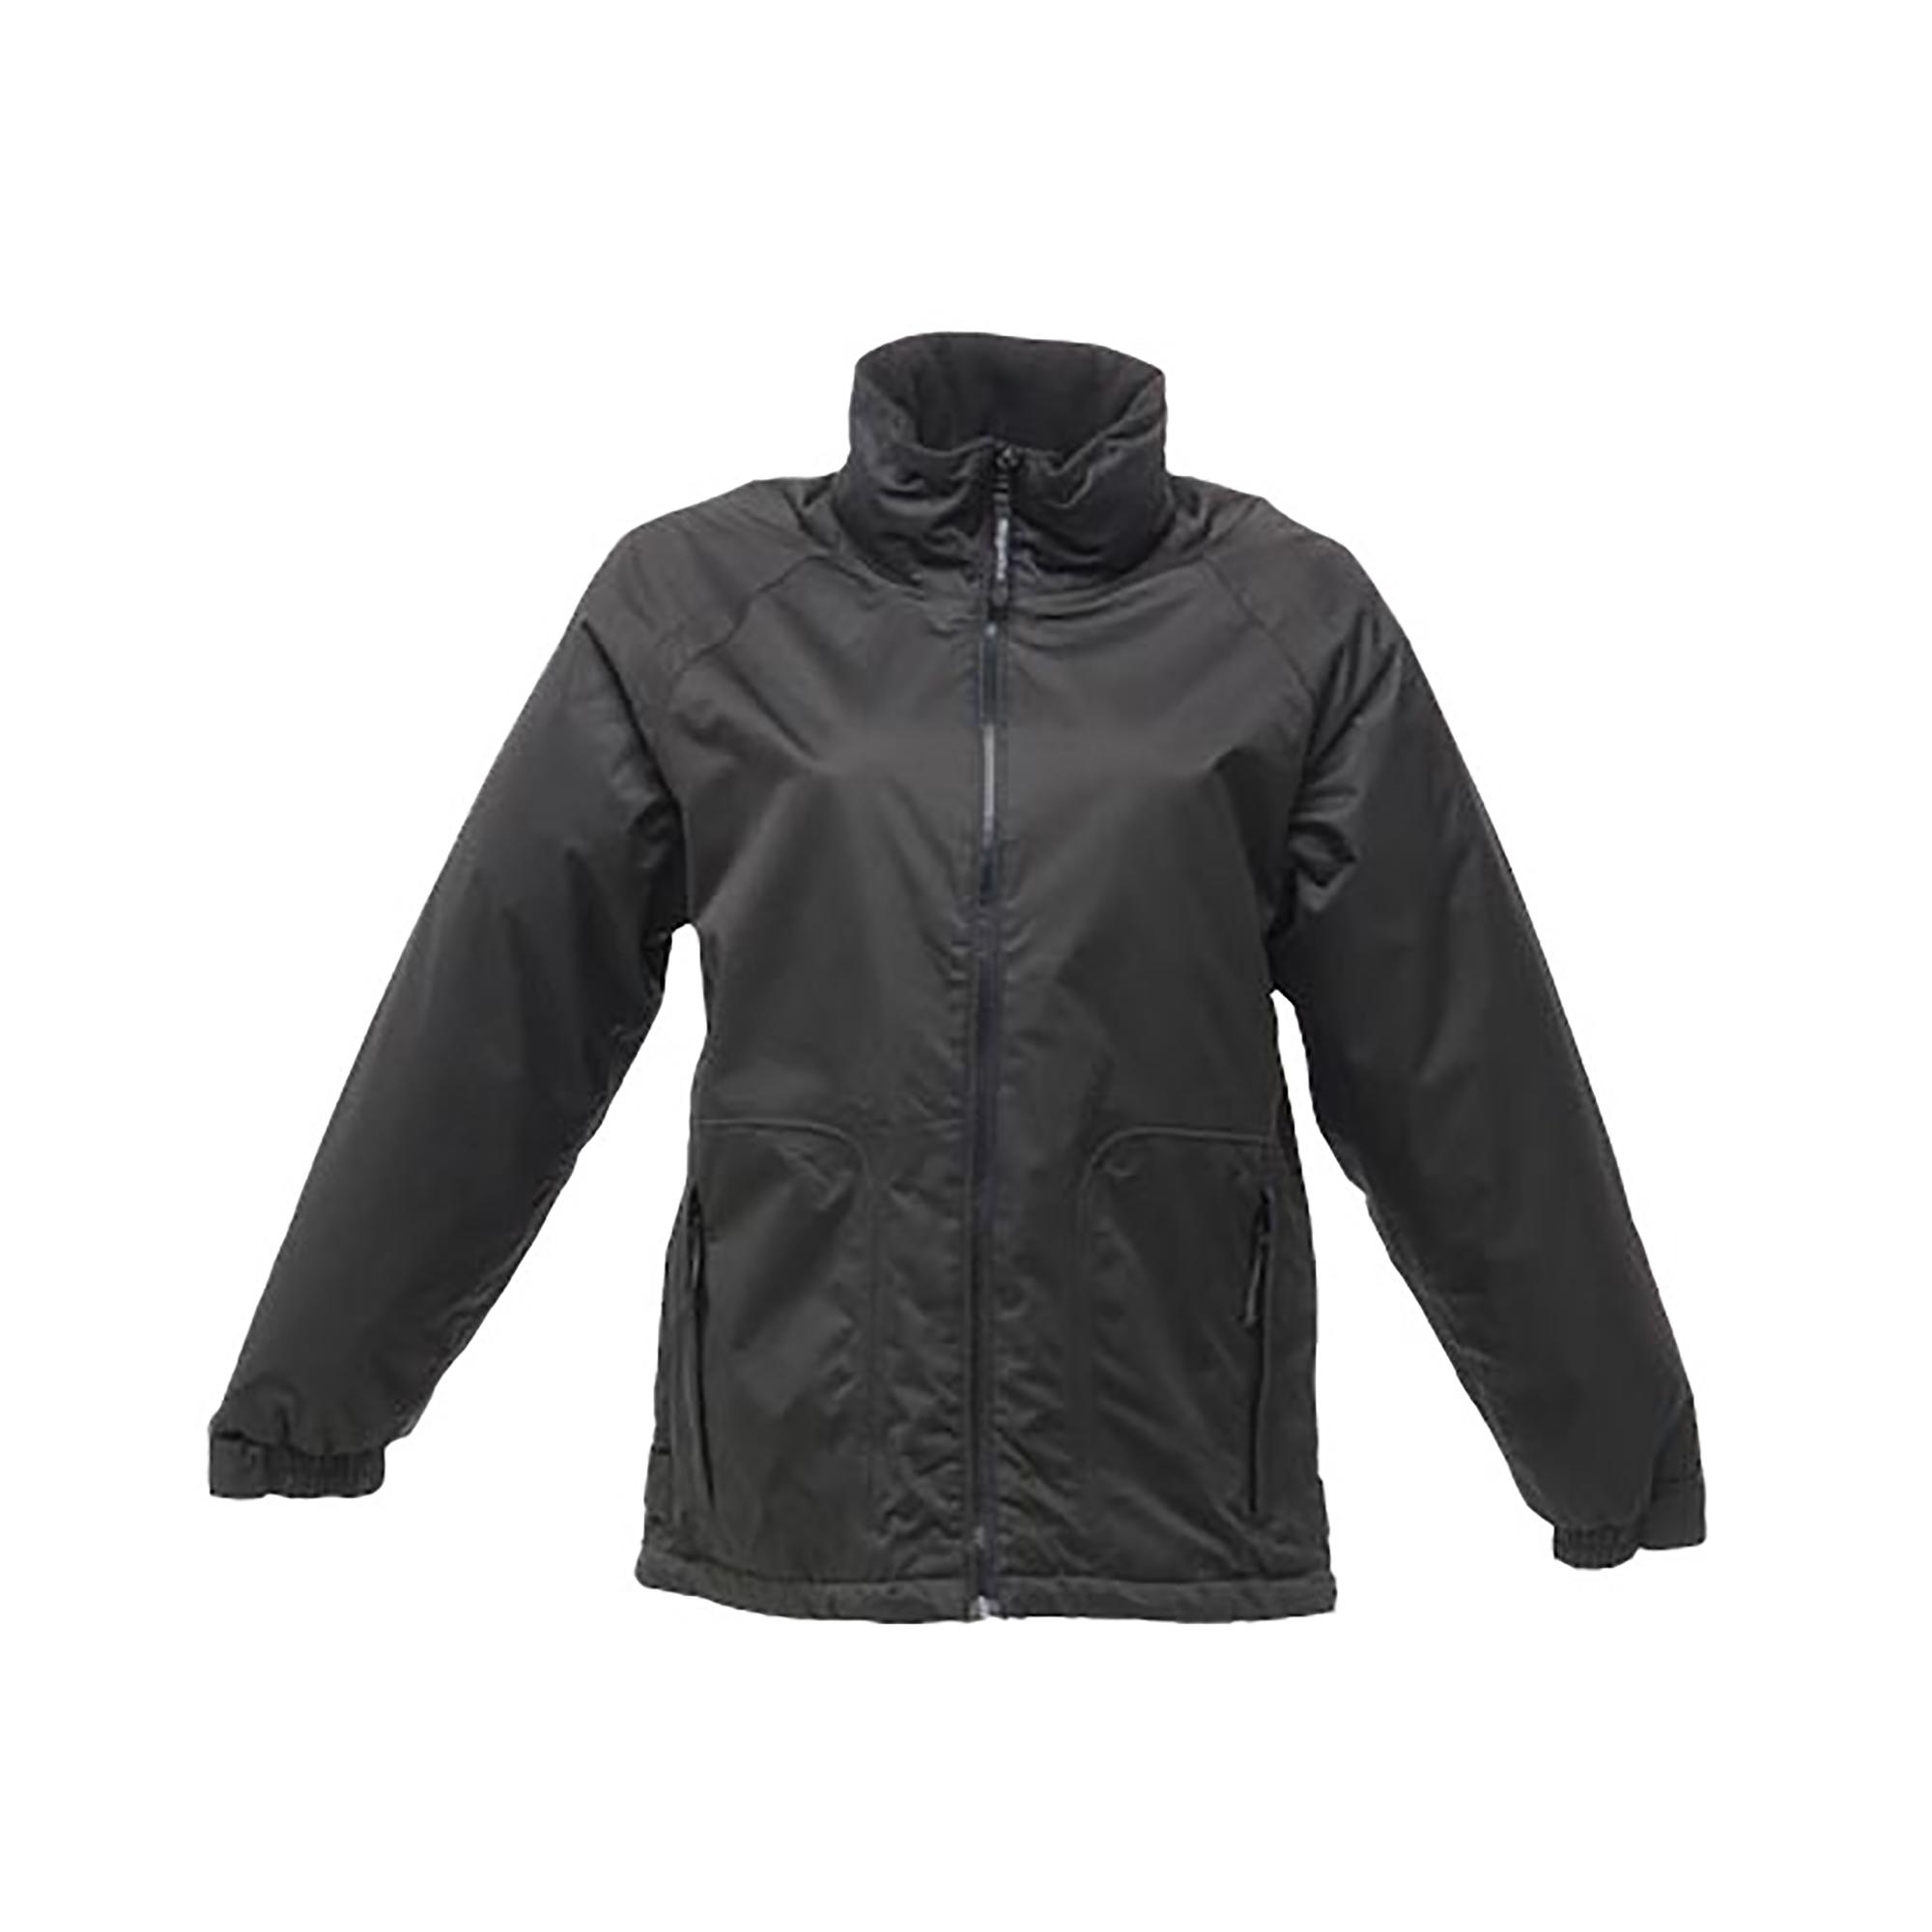 Regatta Ladies/Womens Waterproof Windproof Jacket (10 UK) (Black)